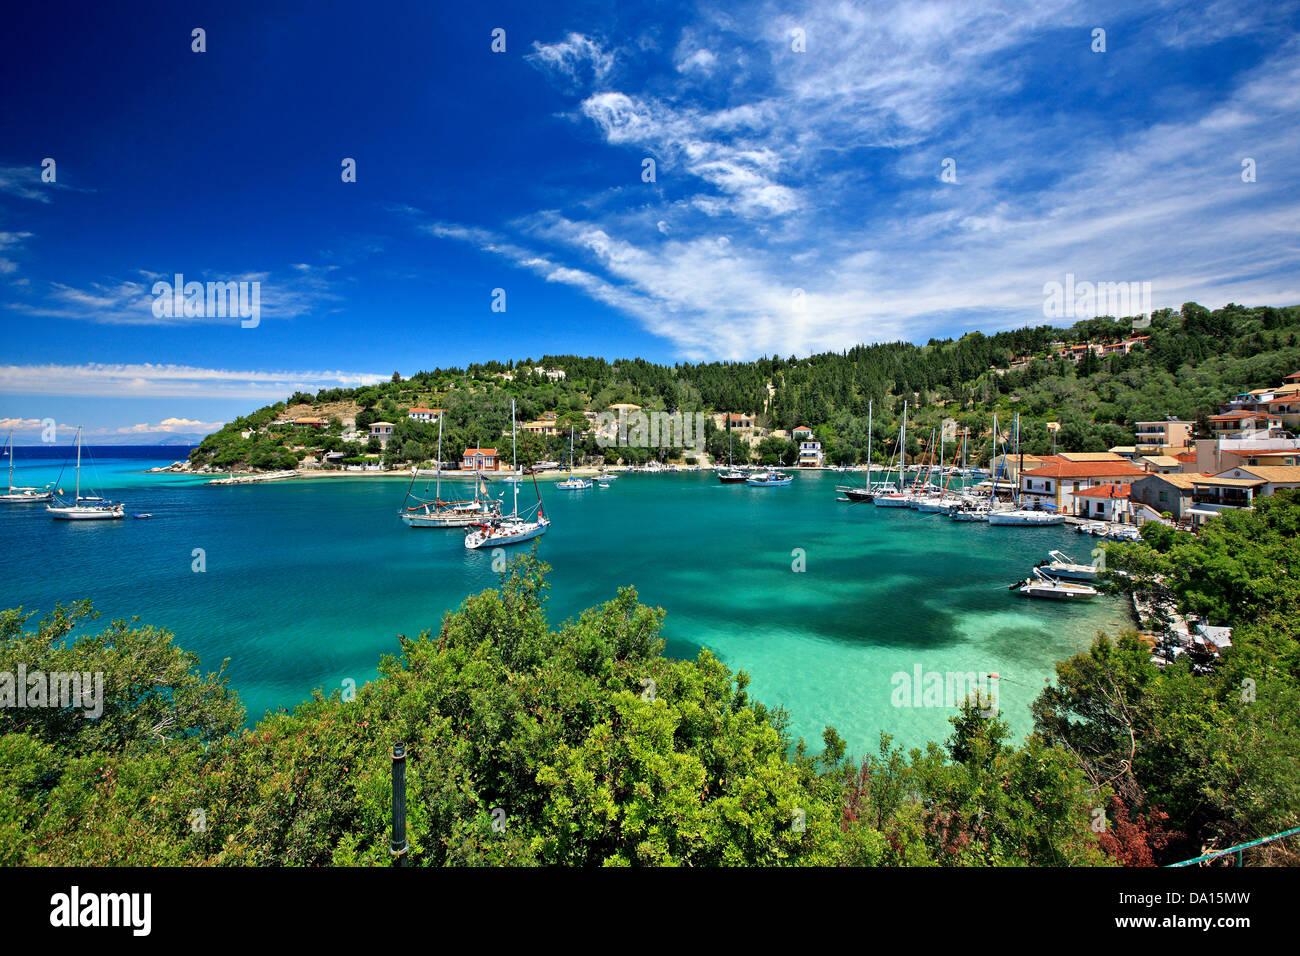 Panoramic view  of Lakka bay and village, Paxos island, Ionian Sea, Eptanisa ('Seven Islands'), Greece. - Stock Image